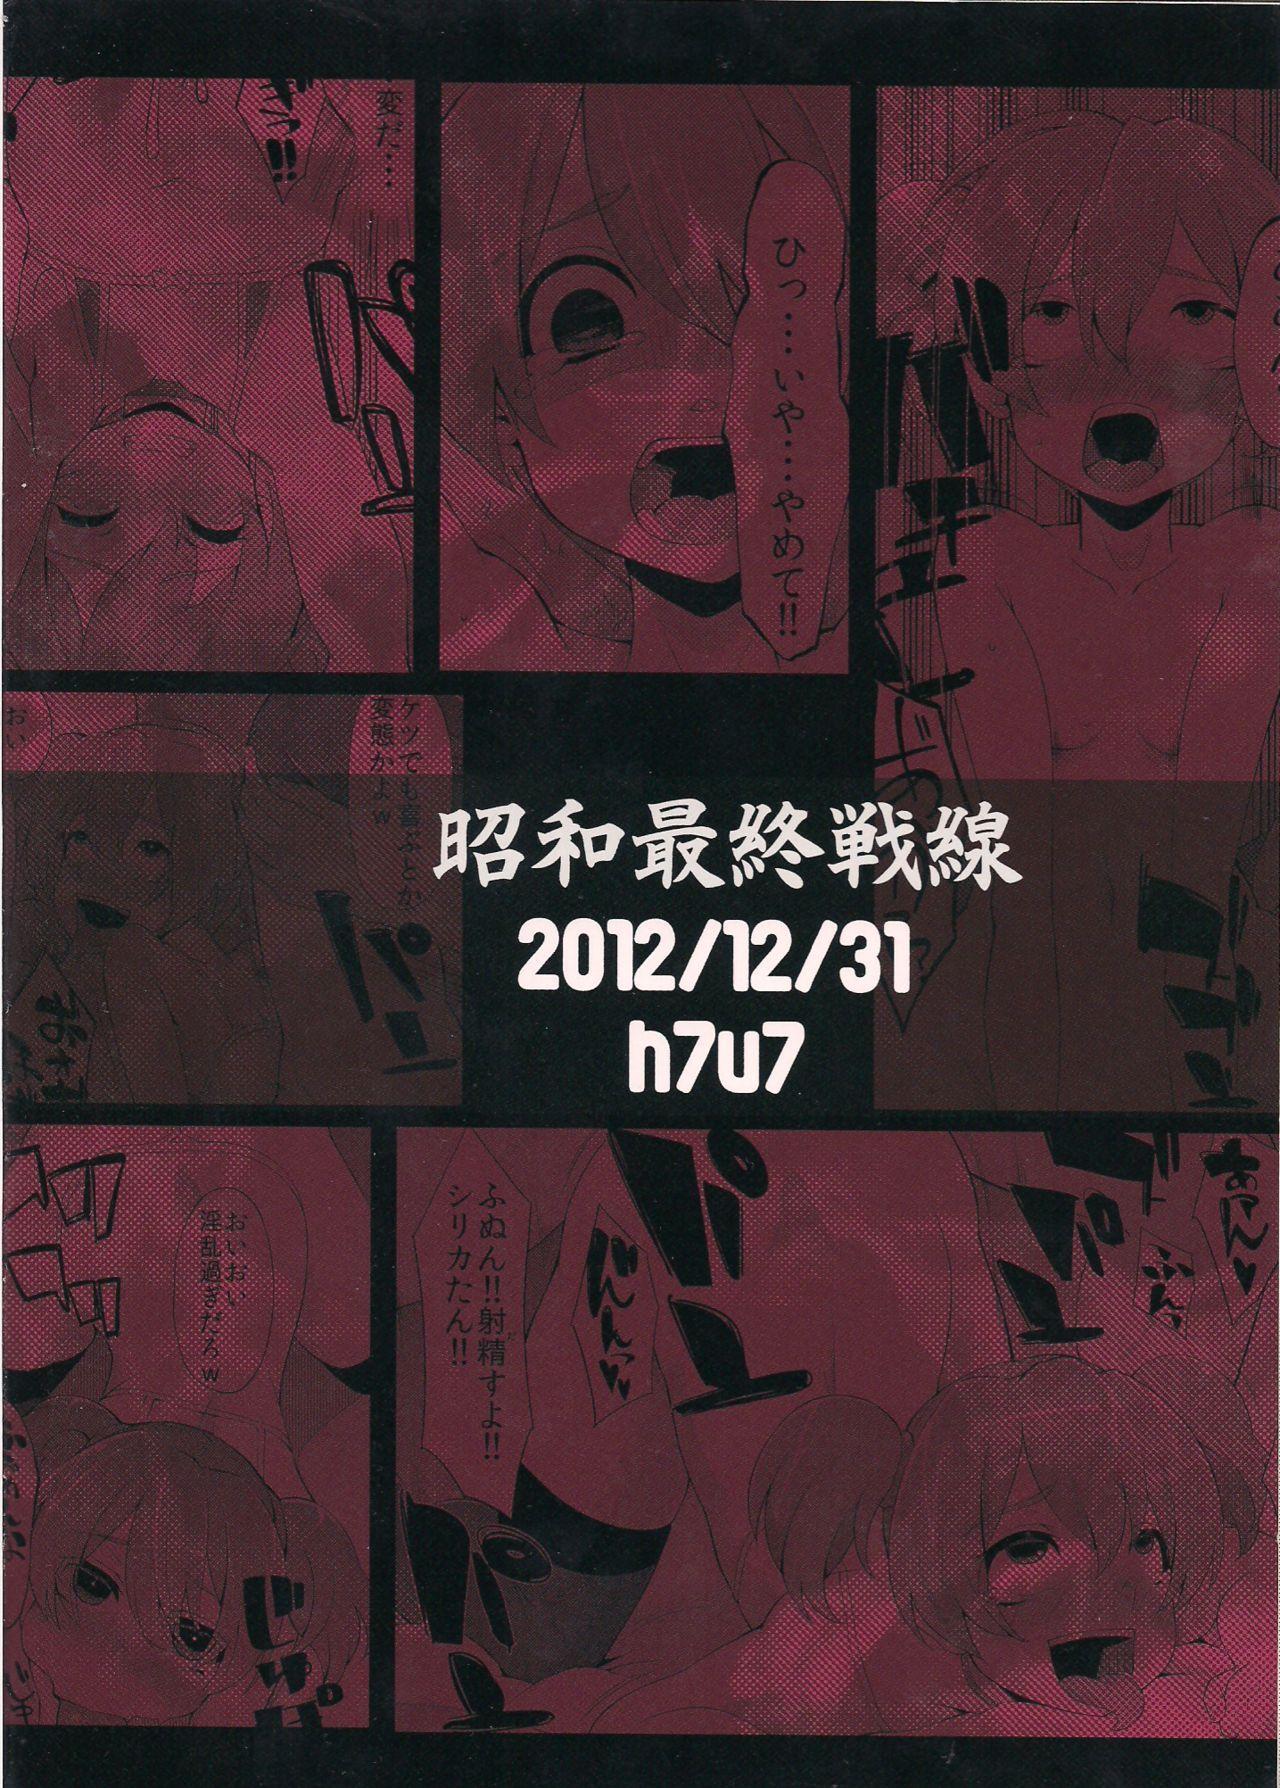 (C83) [Shouwa Saishuu Sensen (Hanauna)] Silica-tan Bibouroku. - My Sweet Silica Memorandum Record (Sword Art Online) 27